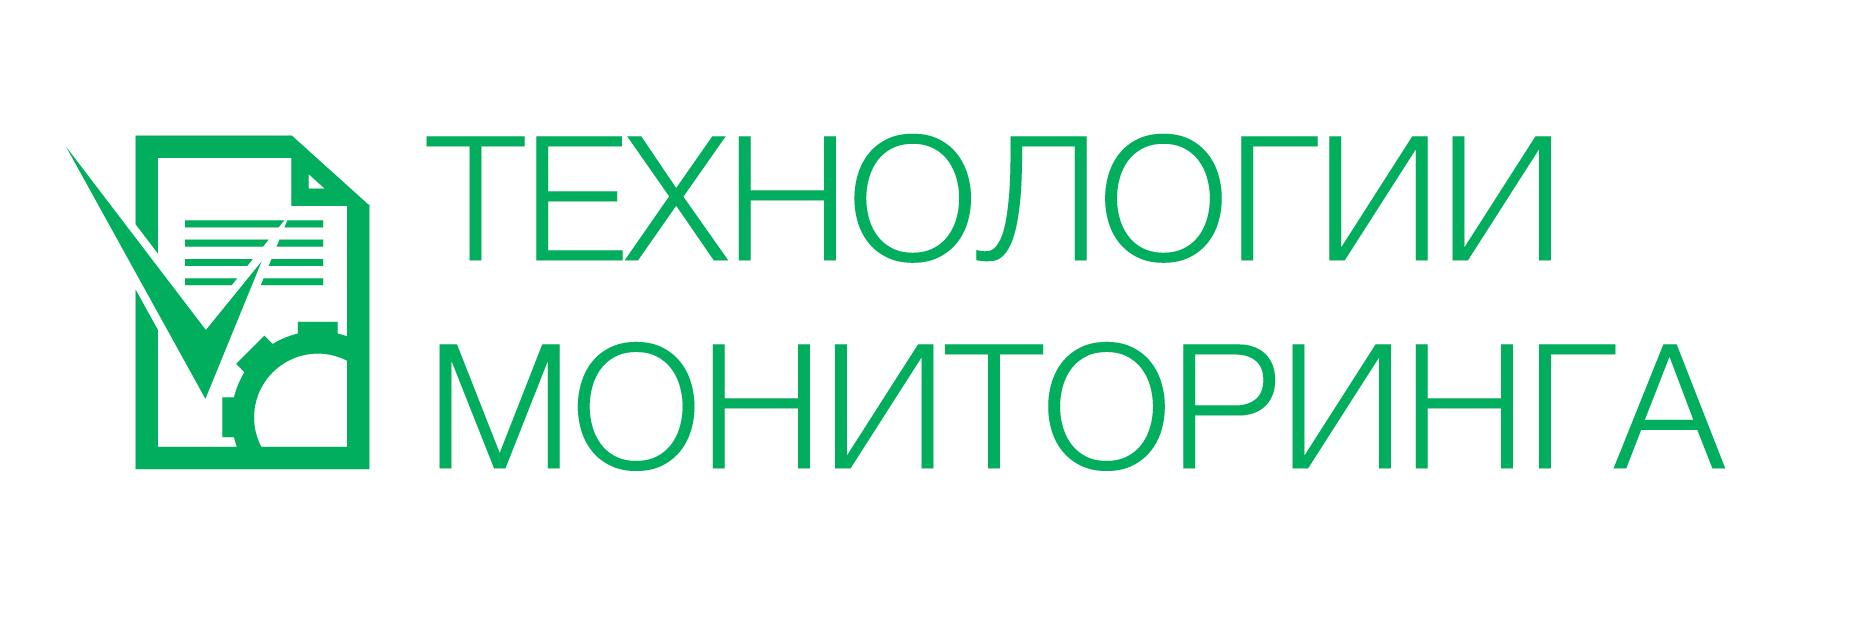 Разработка логотипа фото f_456596ce7dd145dc.jpg